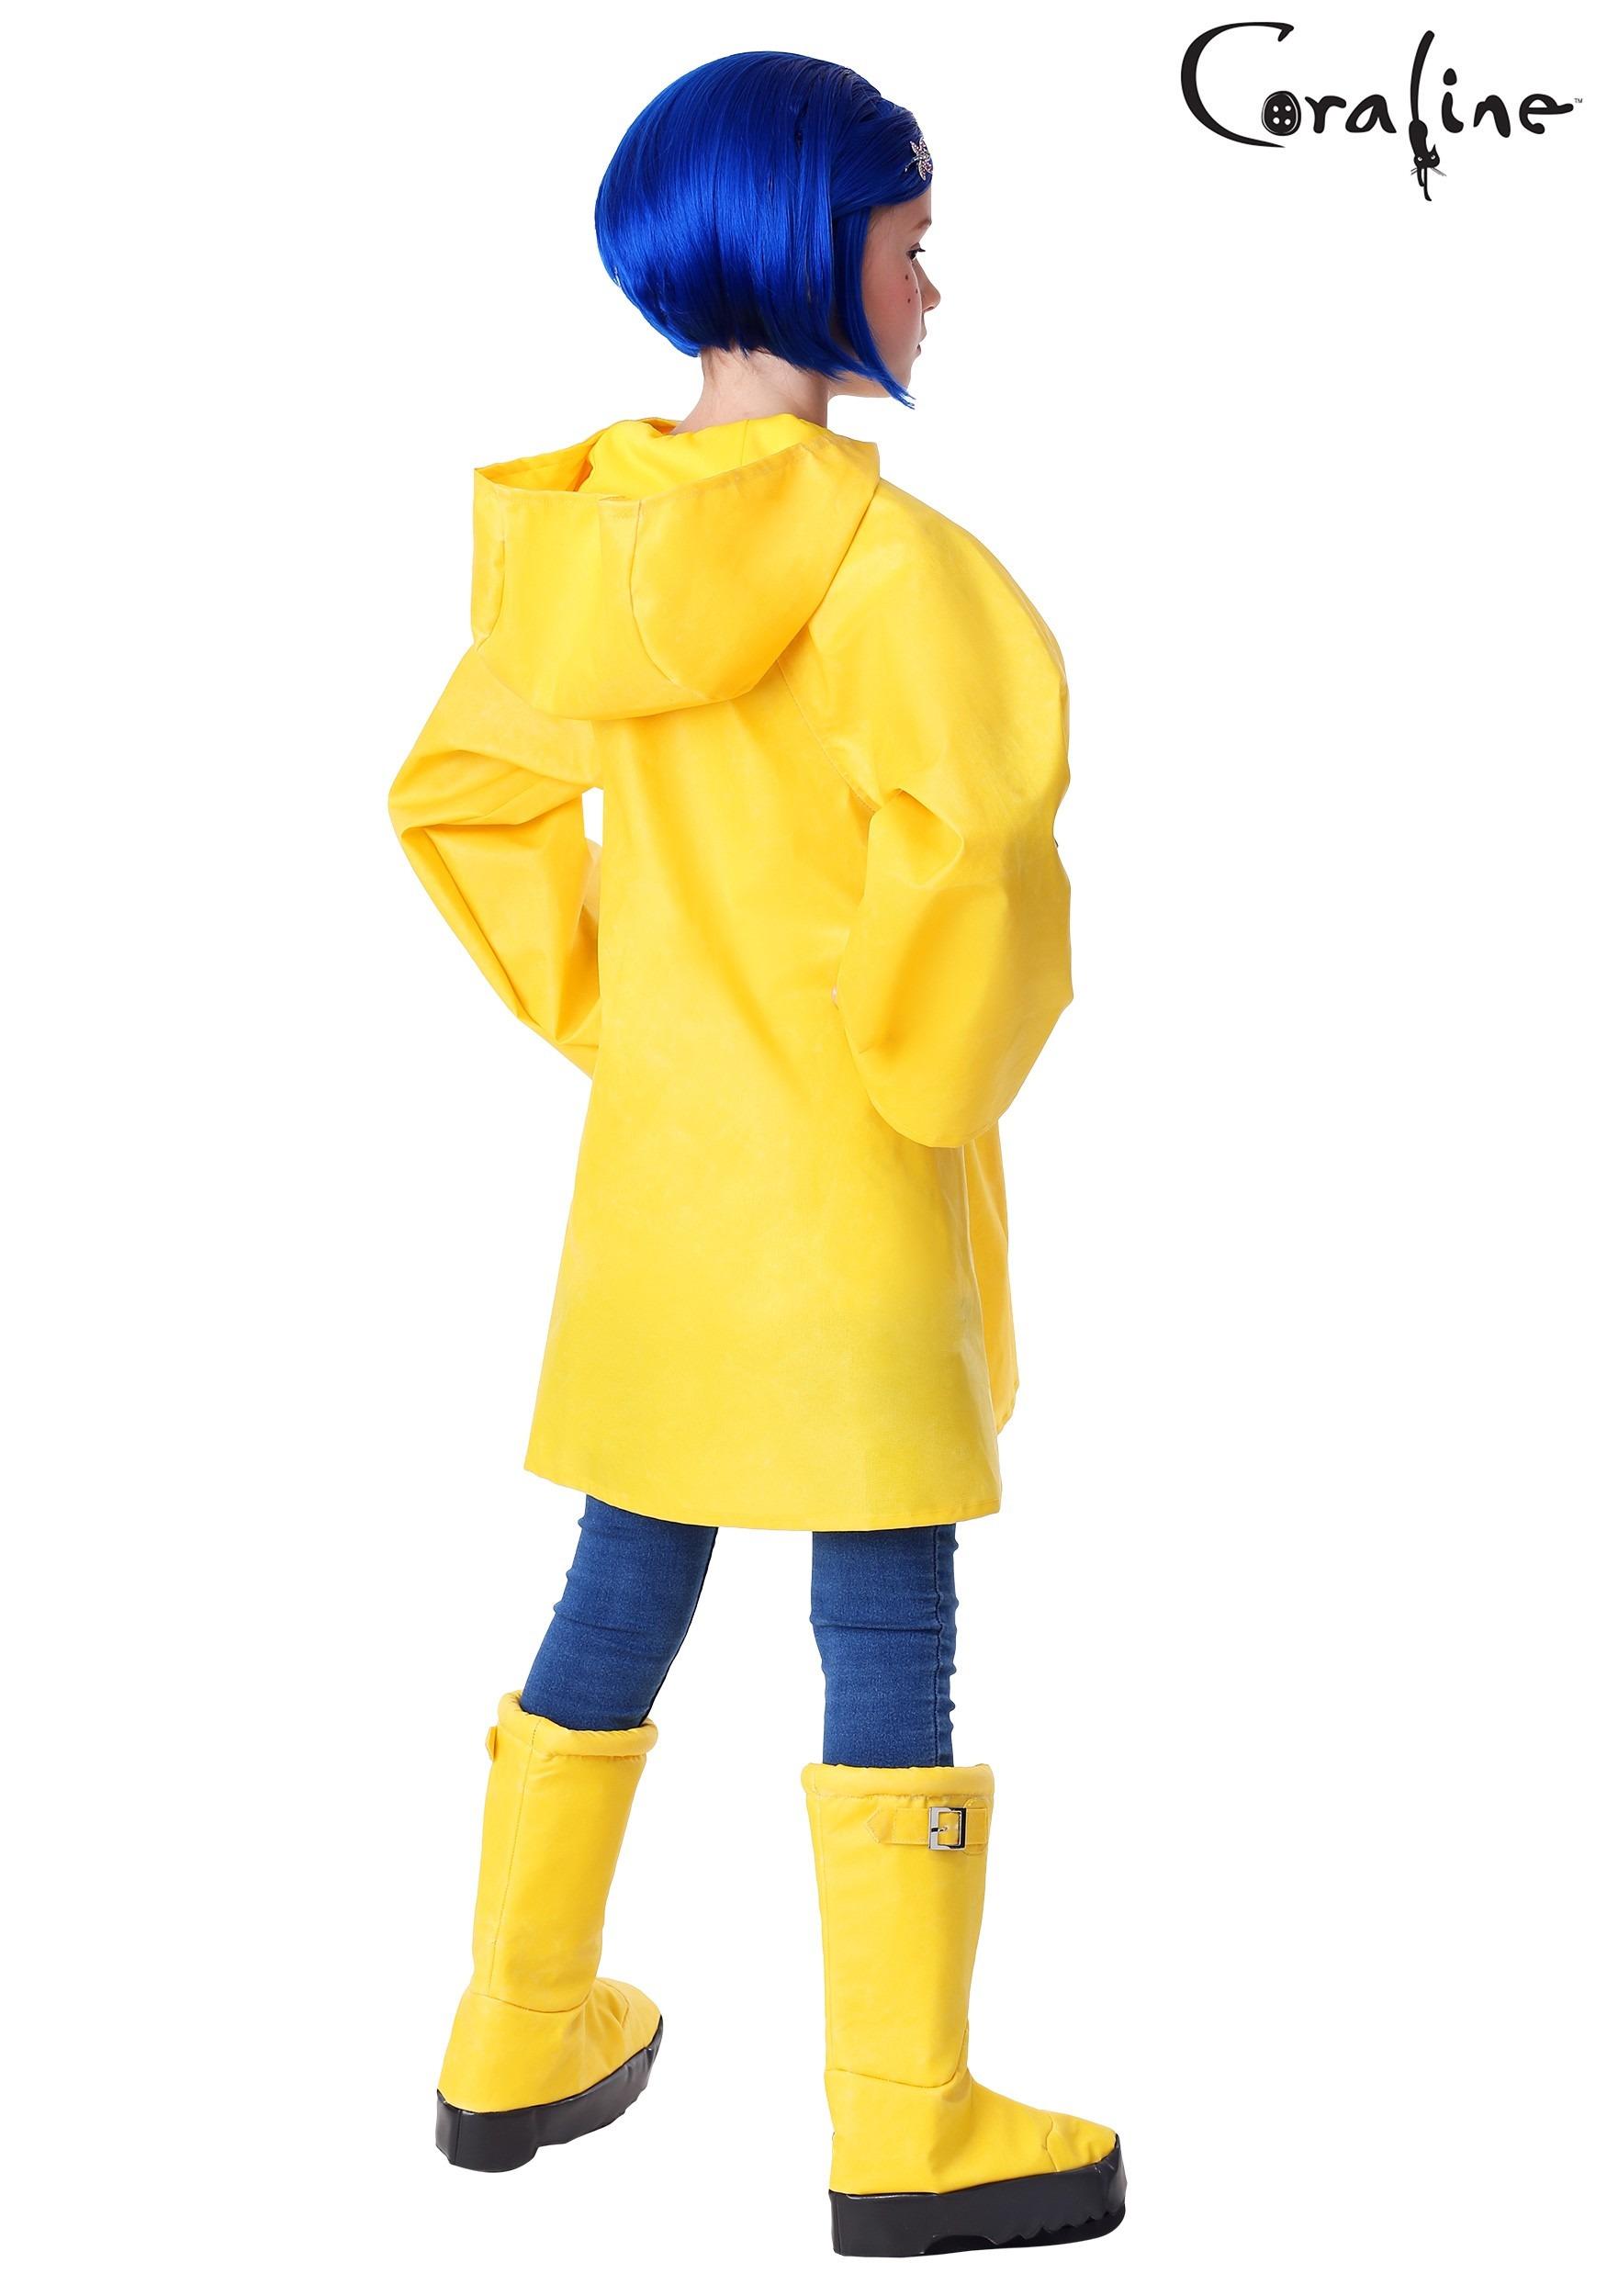 Coraline Child Costume